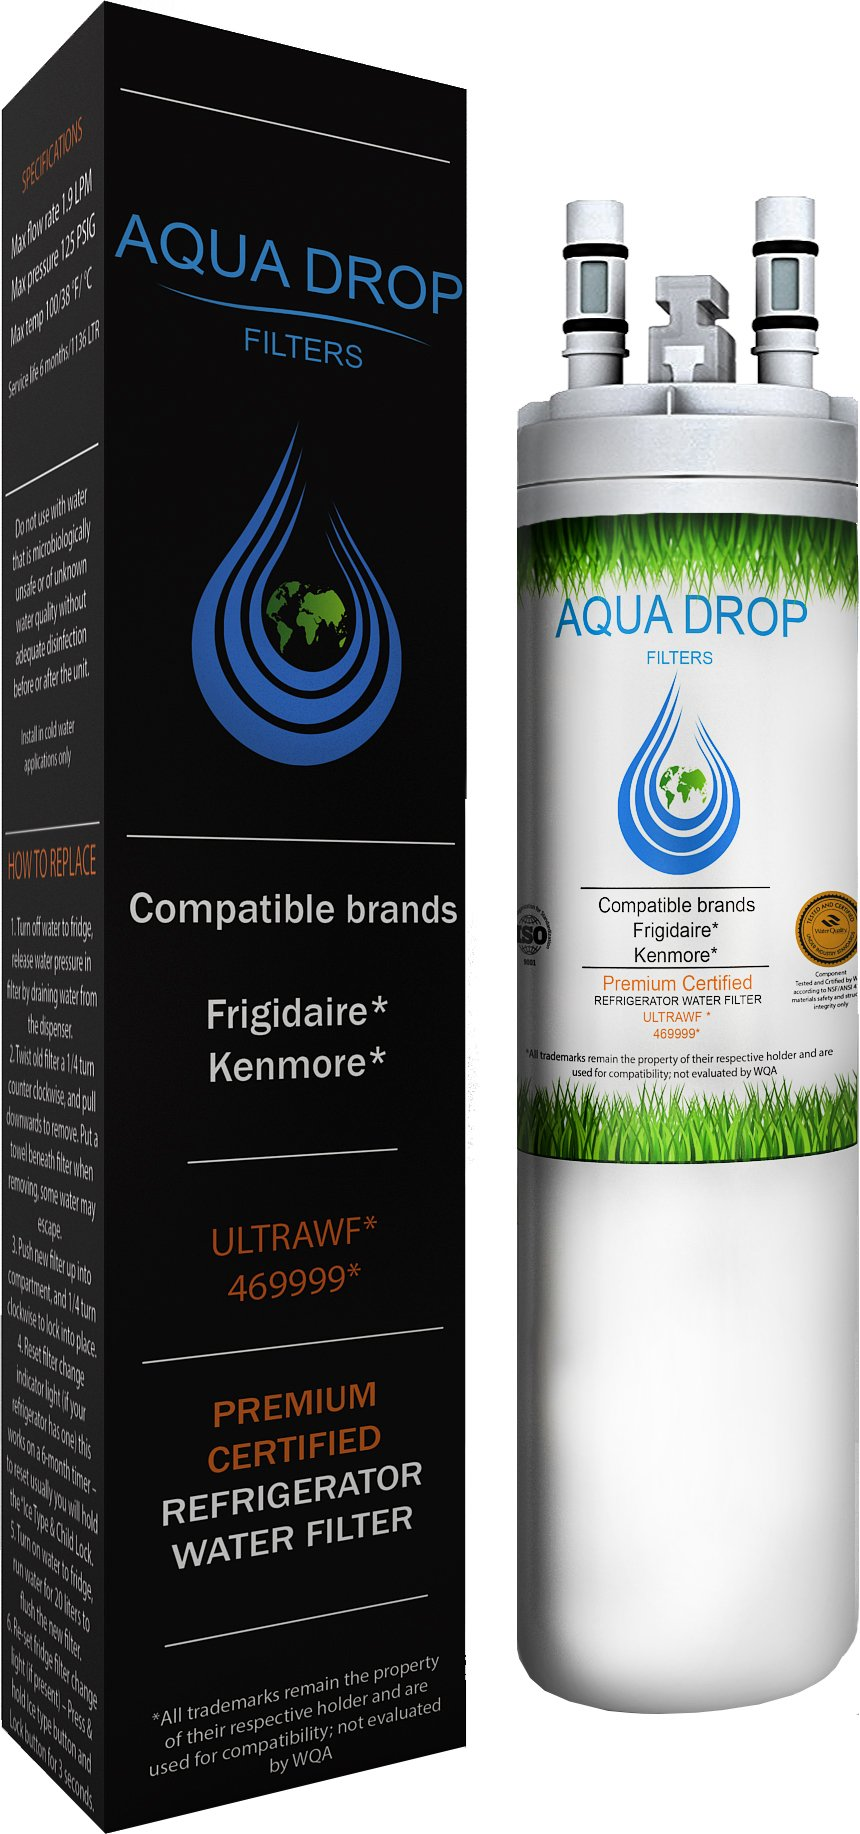 Aqua Drop filters Compatible ULTRAWF Refrigerator Water Filter 9999, 46-9999, FGHC2331PFAA - Certified by WQA